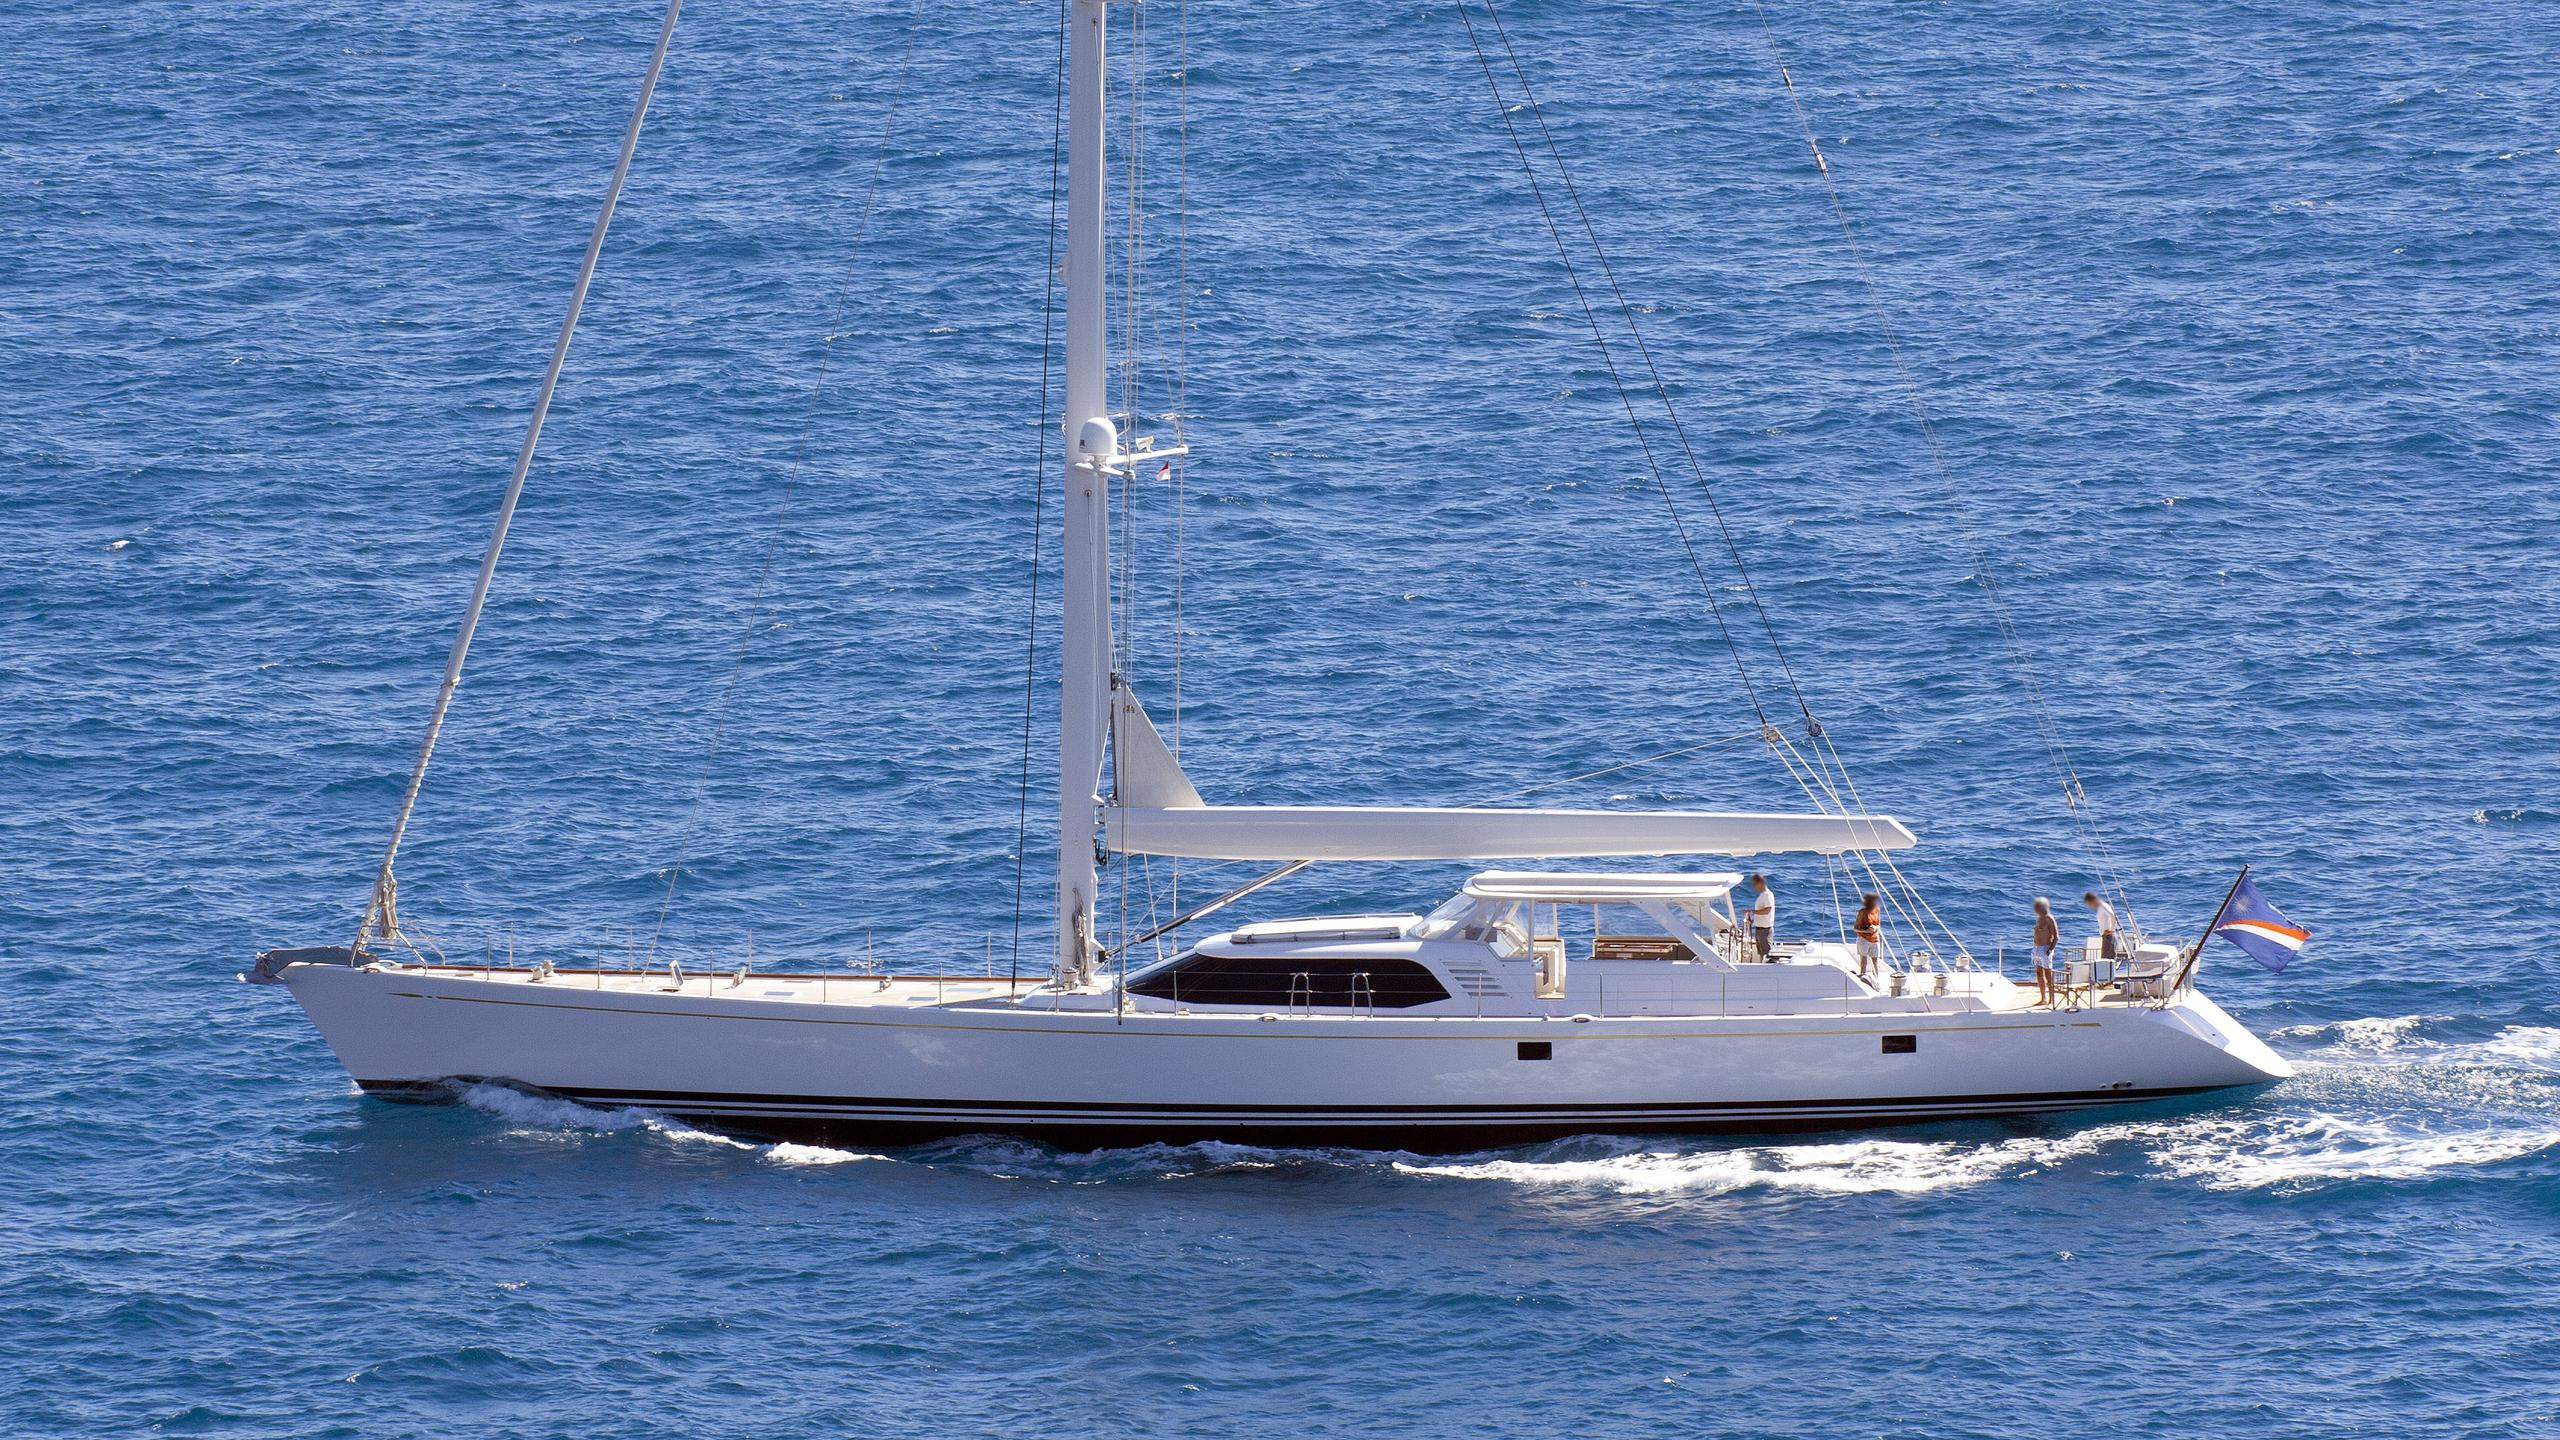 mystery-motor-yacht-nautors-swan-Swan-2000-34m-sailing